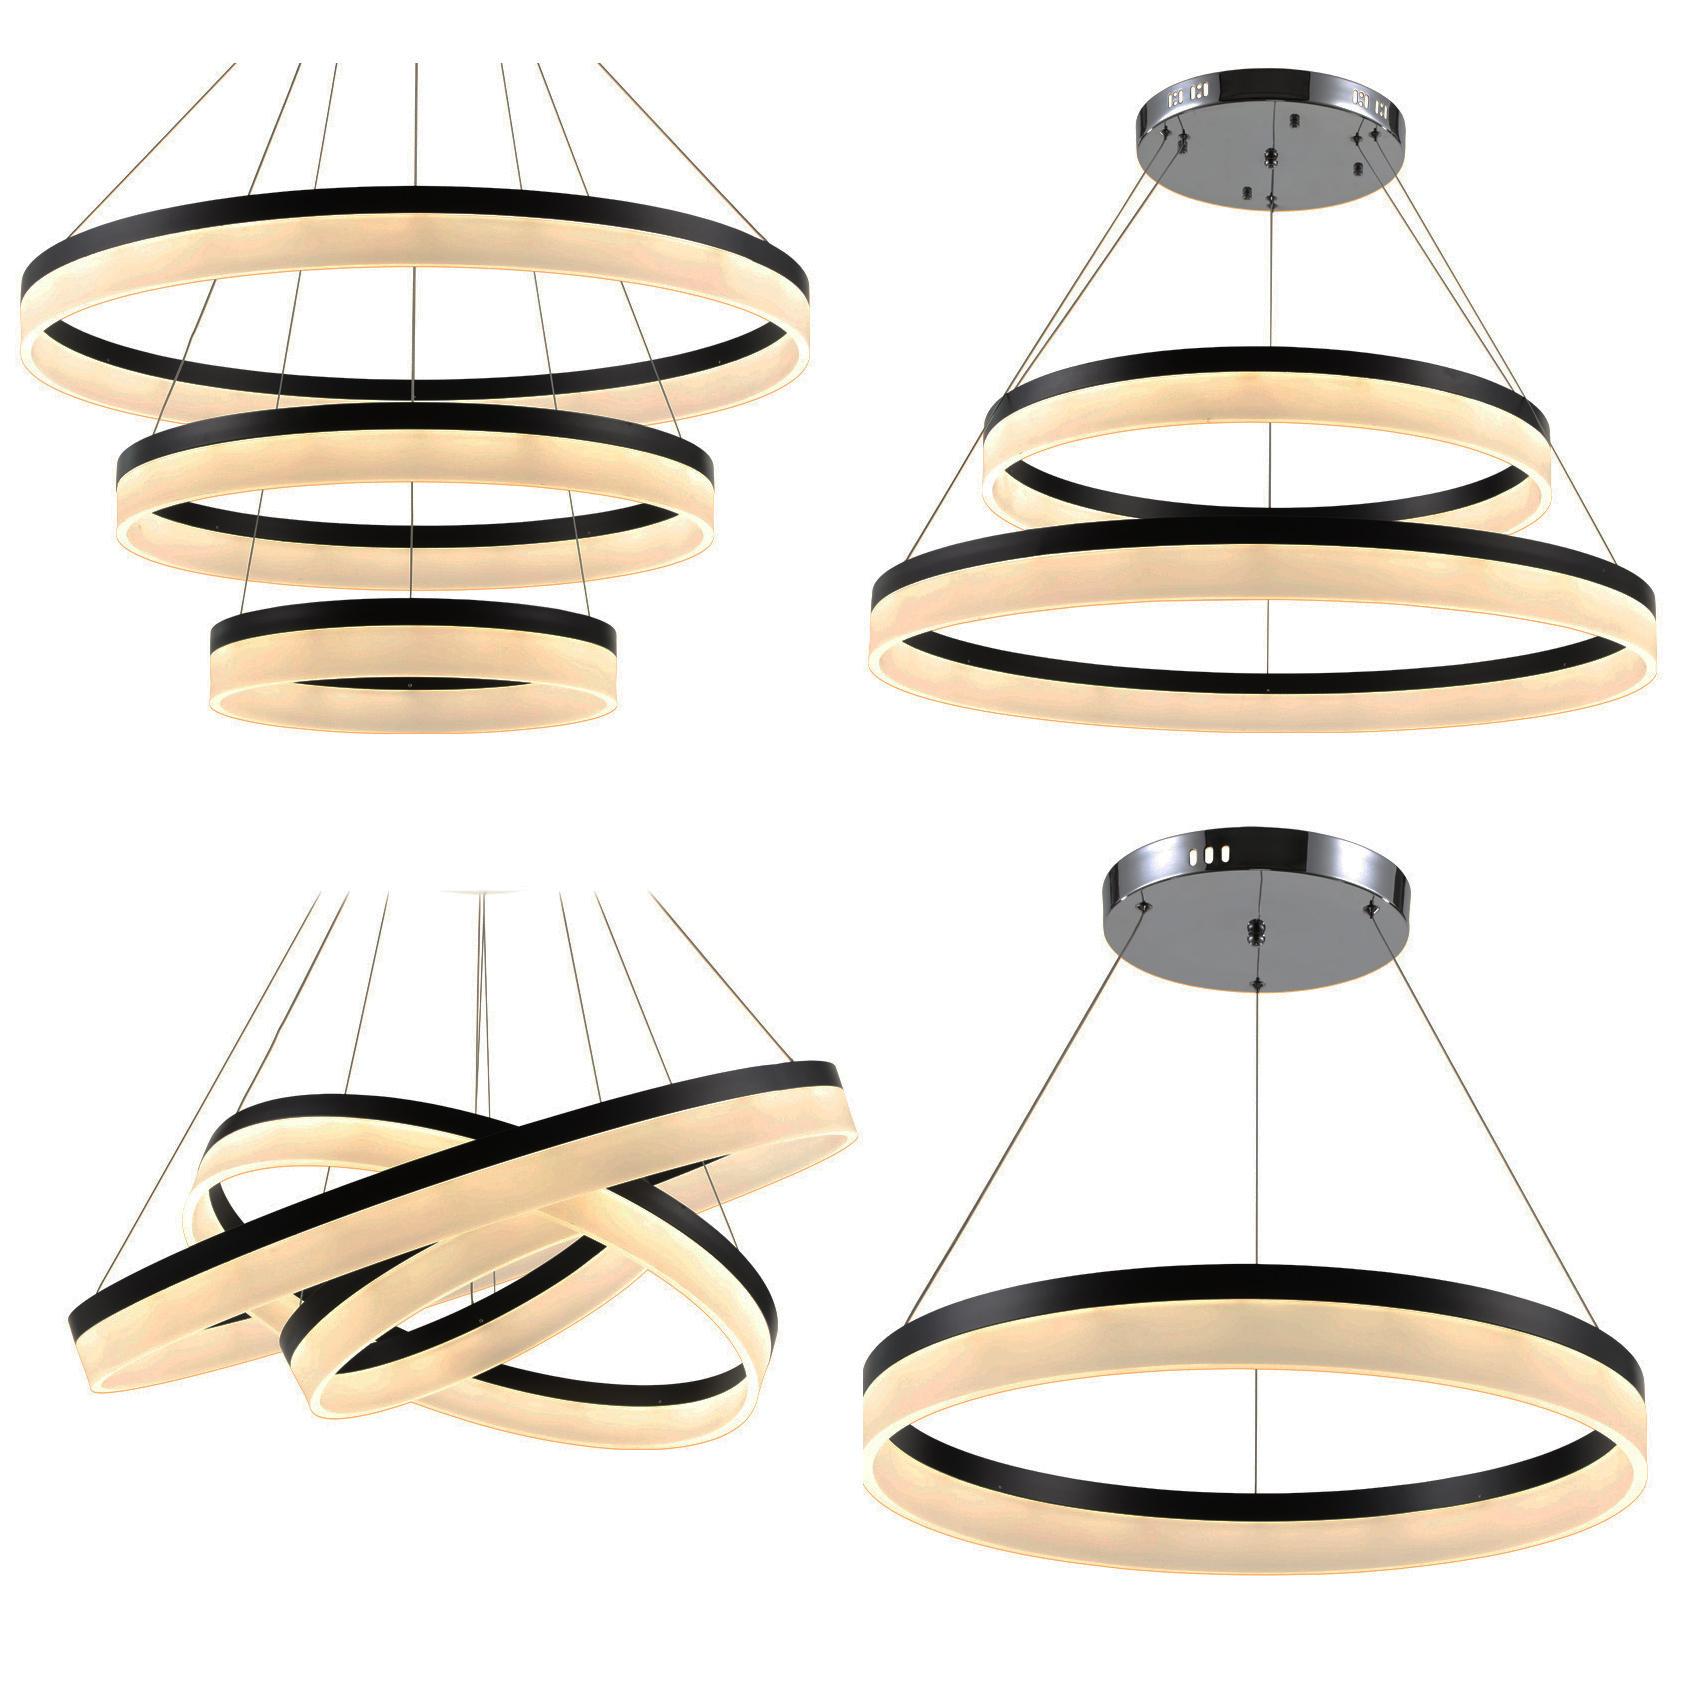 led pendelleuchte 6053 black 80x60x40cm ringe neutralwei alu rahmen bis 108w a ebay. Black Bedroom Furniture Sets. Home Design Ideas